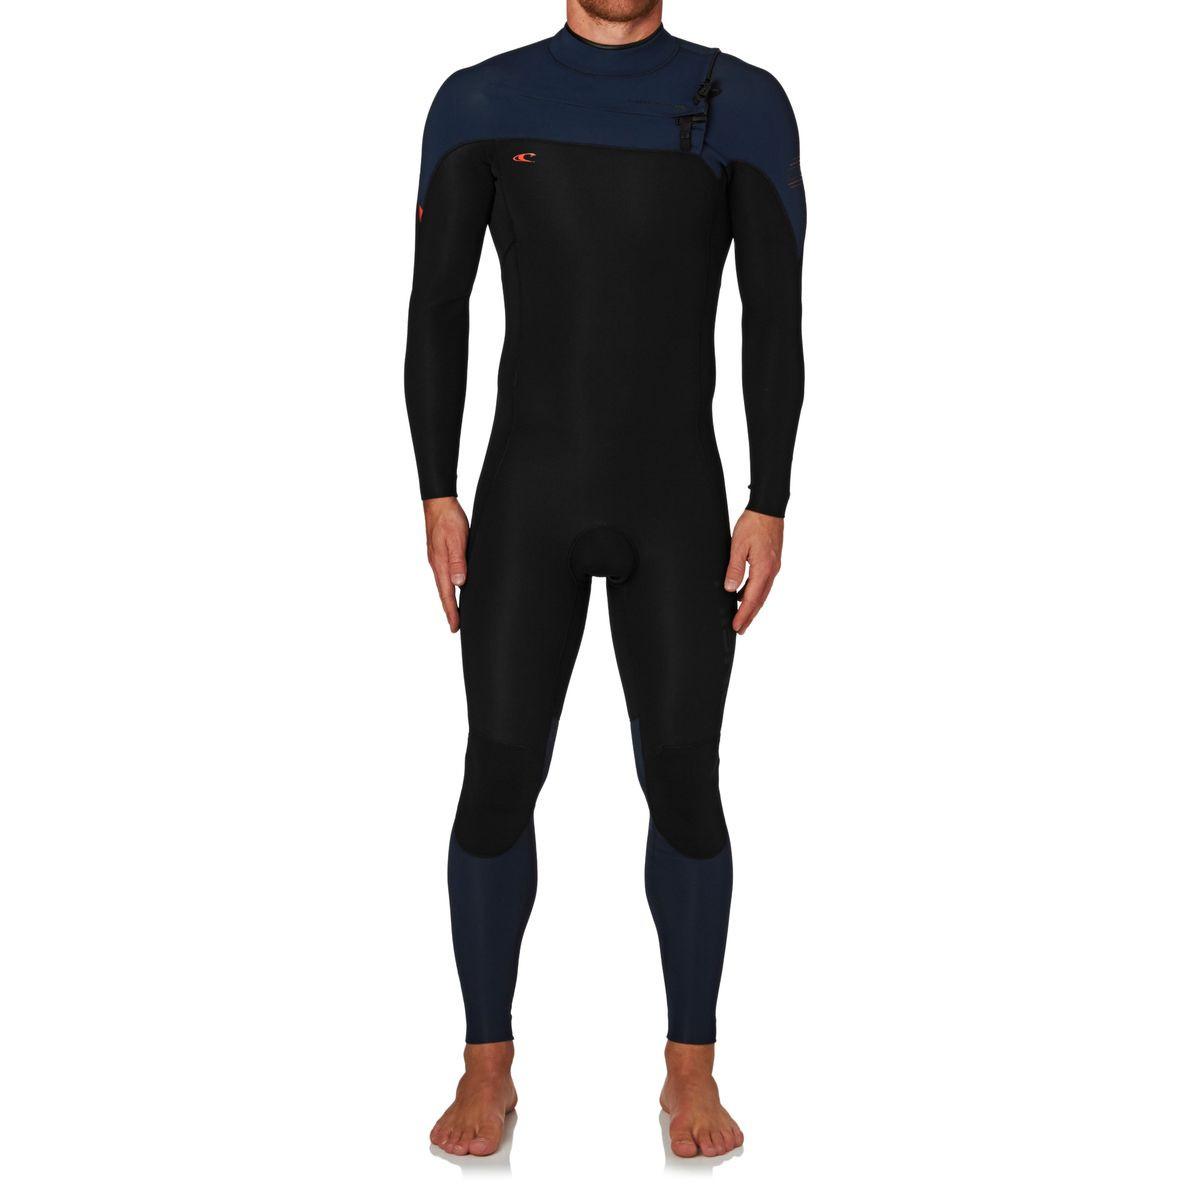 O'Neill Hyperfreak 3/2mm 2017 Chest Zip Wetsuit - Black/ Navy/ Neon Red